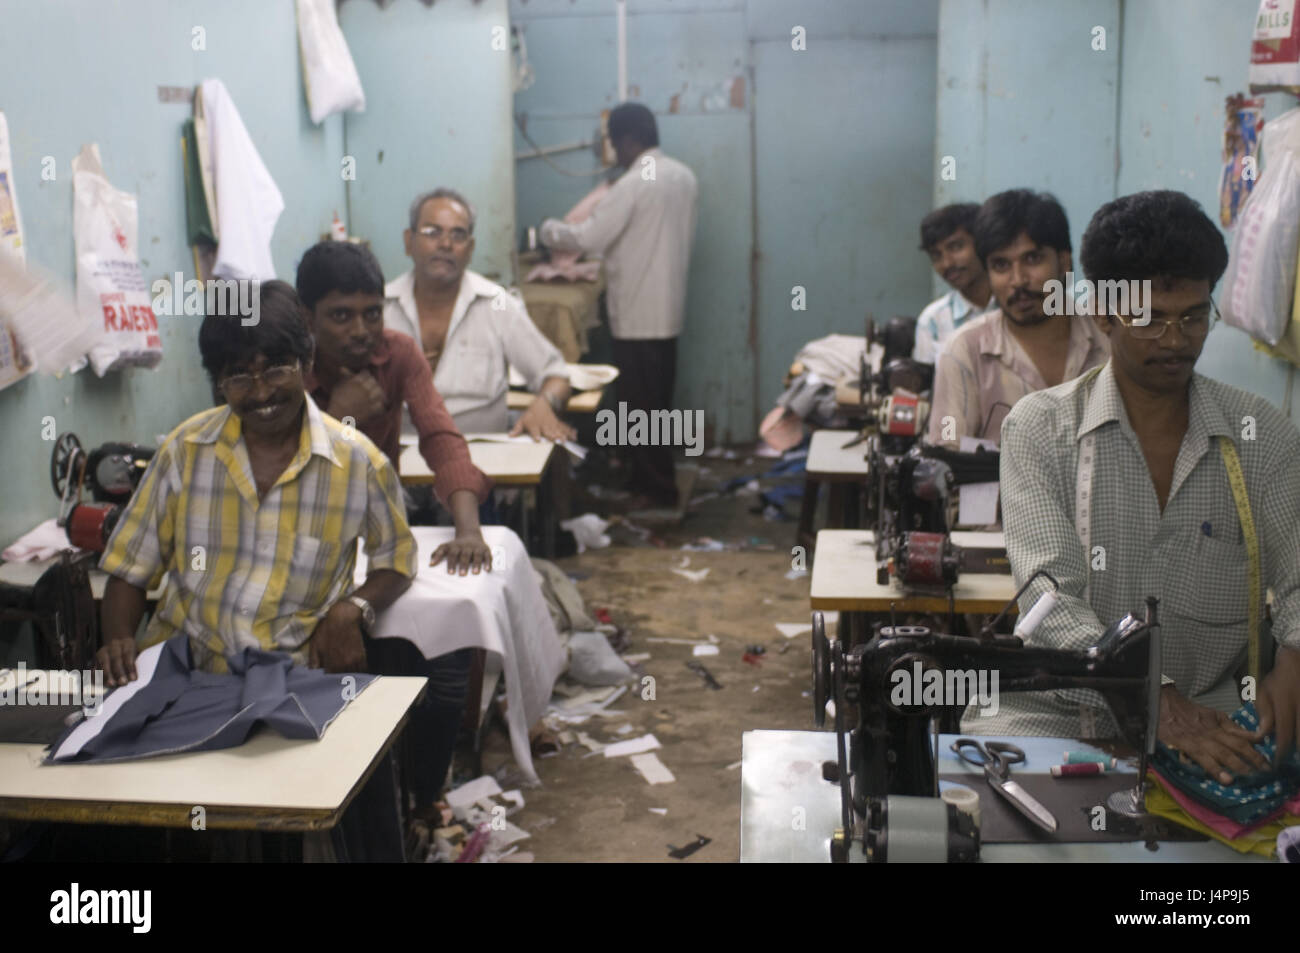 Needlework, locals, work, port Blair, Andamanen, India, no model release, - Stock Image